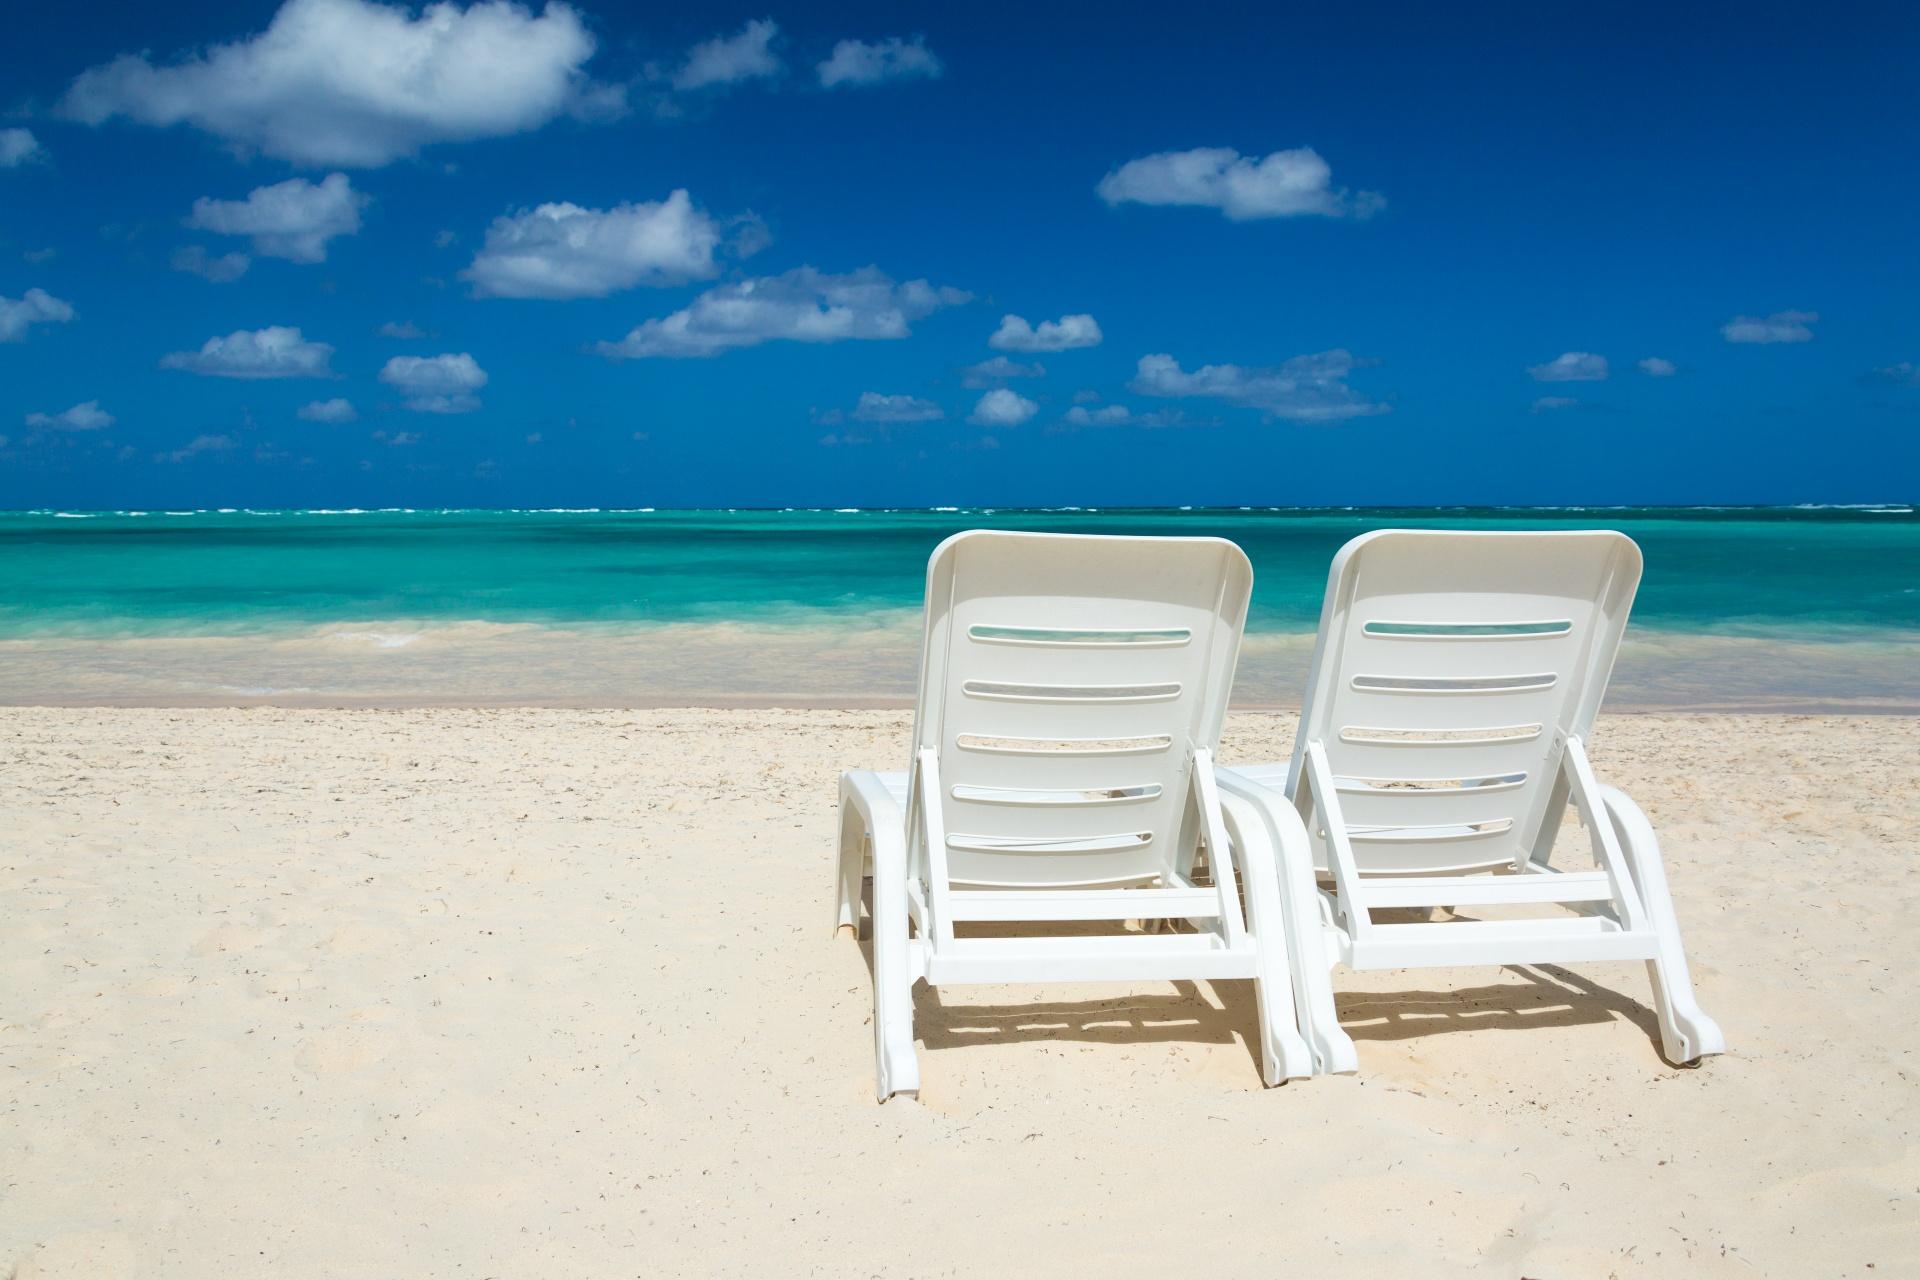 beach-chairs-and-sea-14883024251V4.jpg